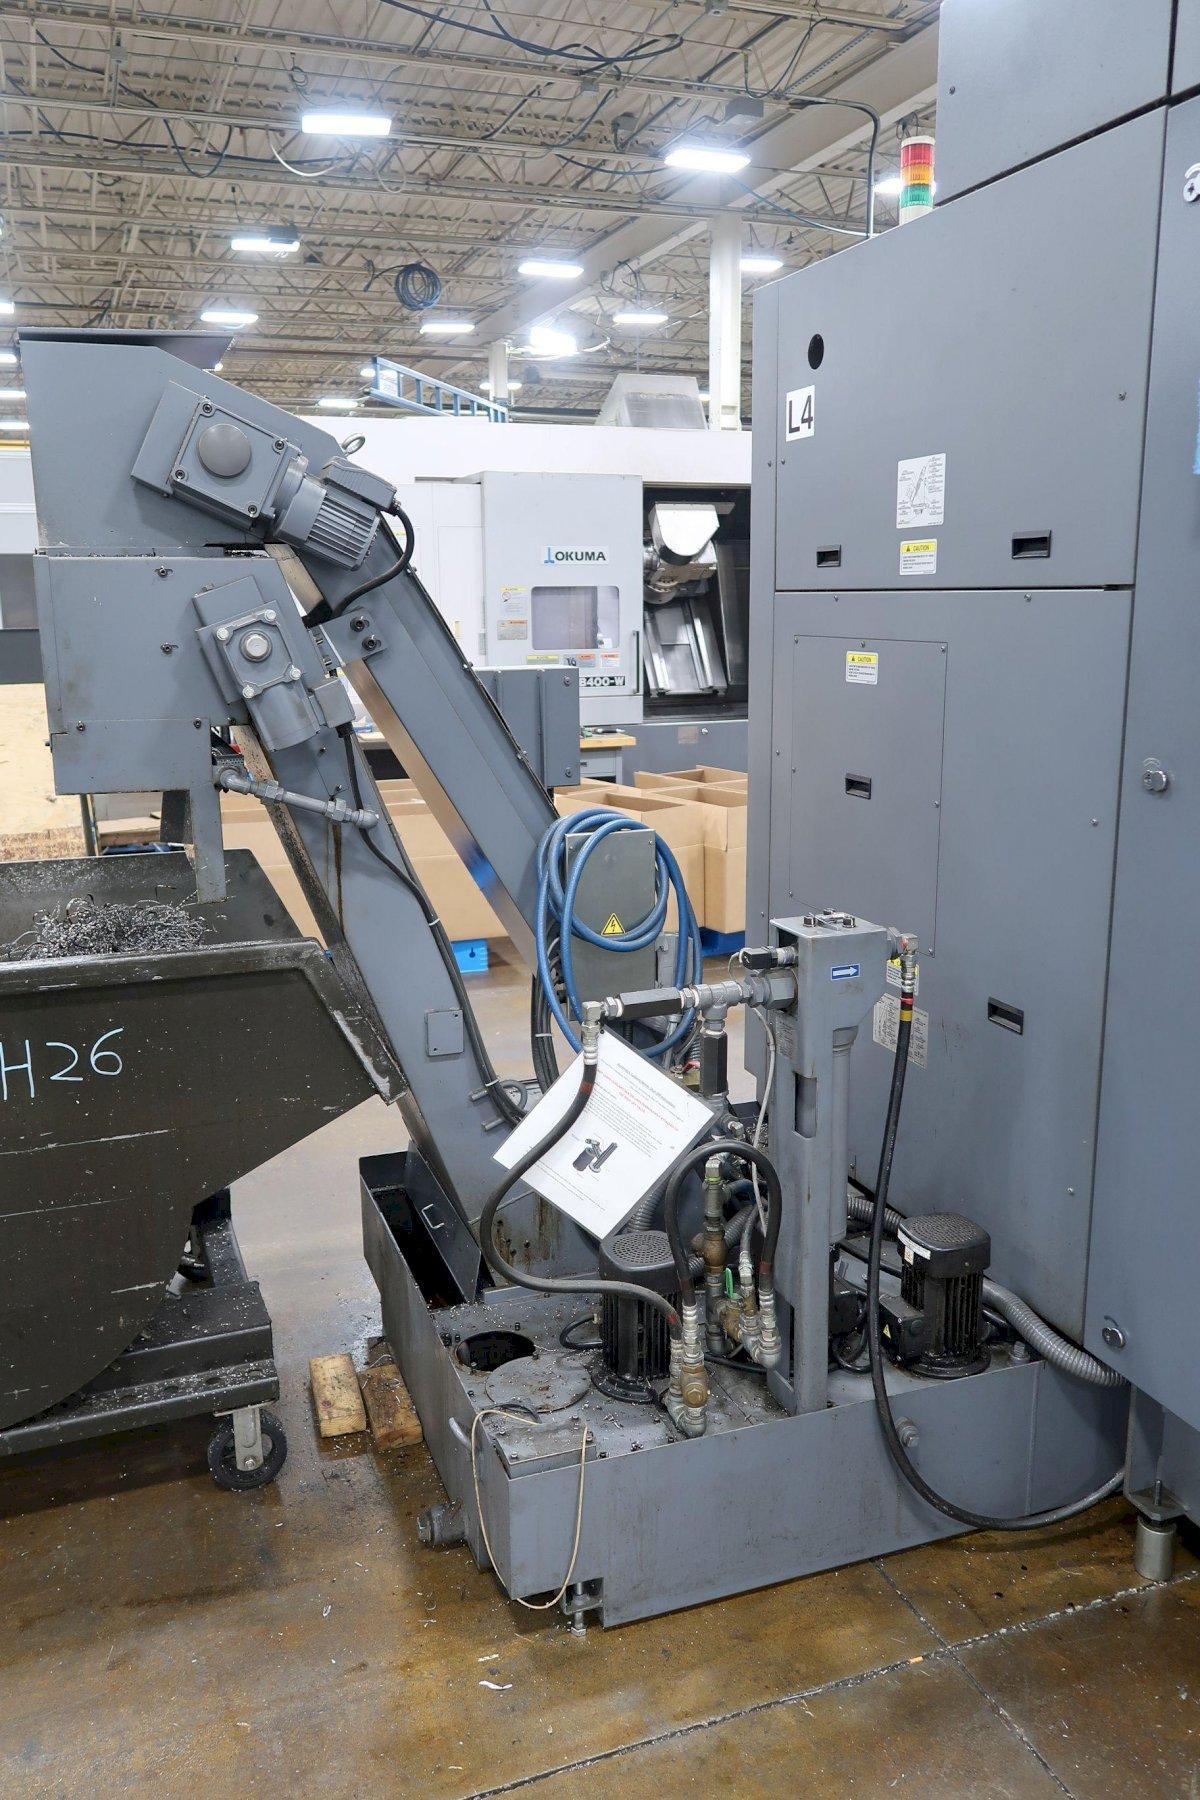 2010 Okuma Multus B400W - CNC Horizontal Lathe